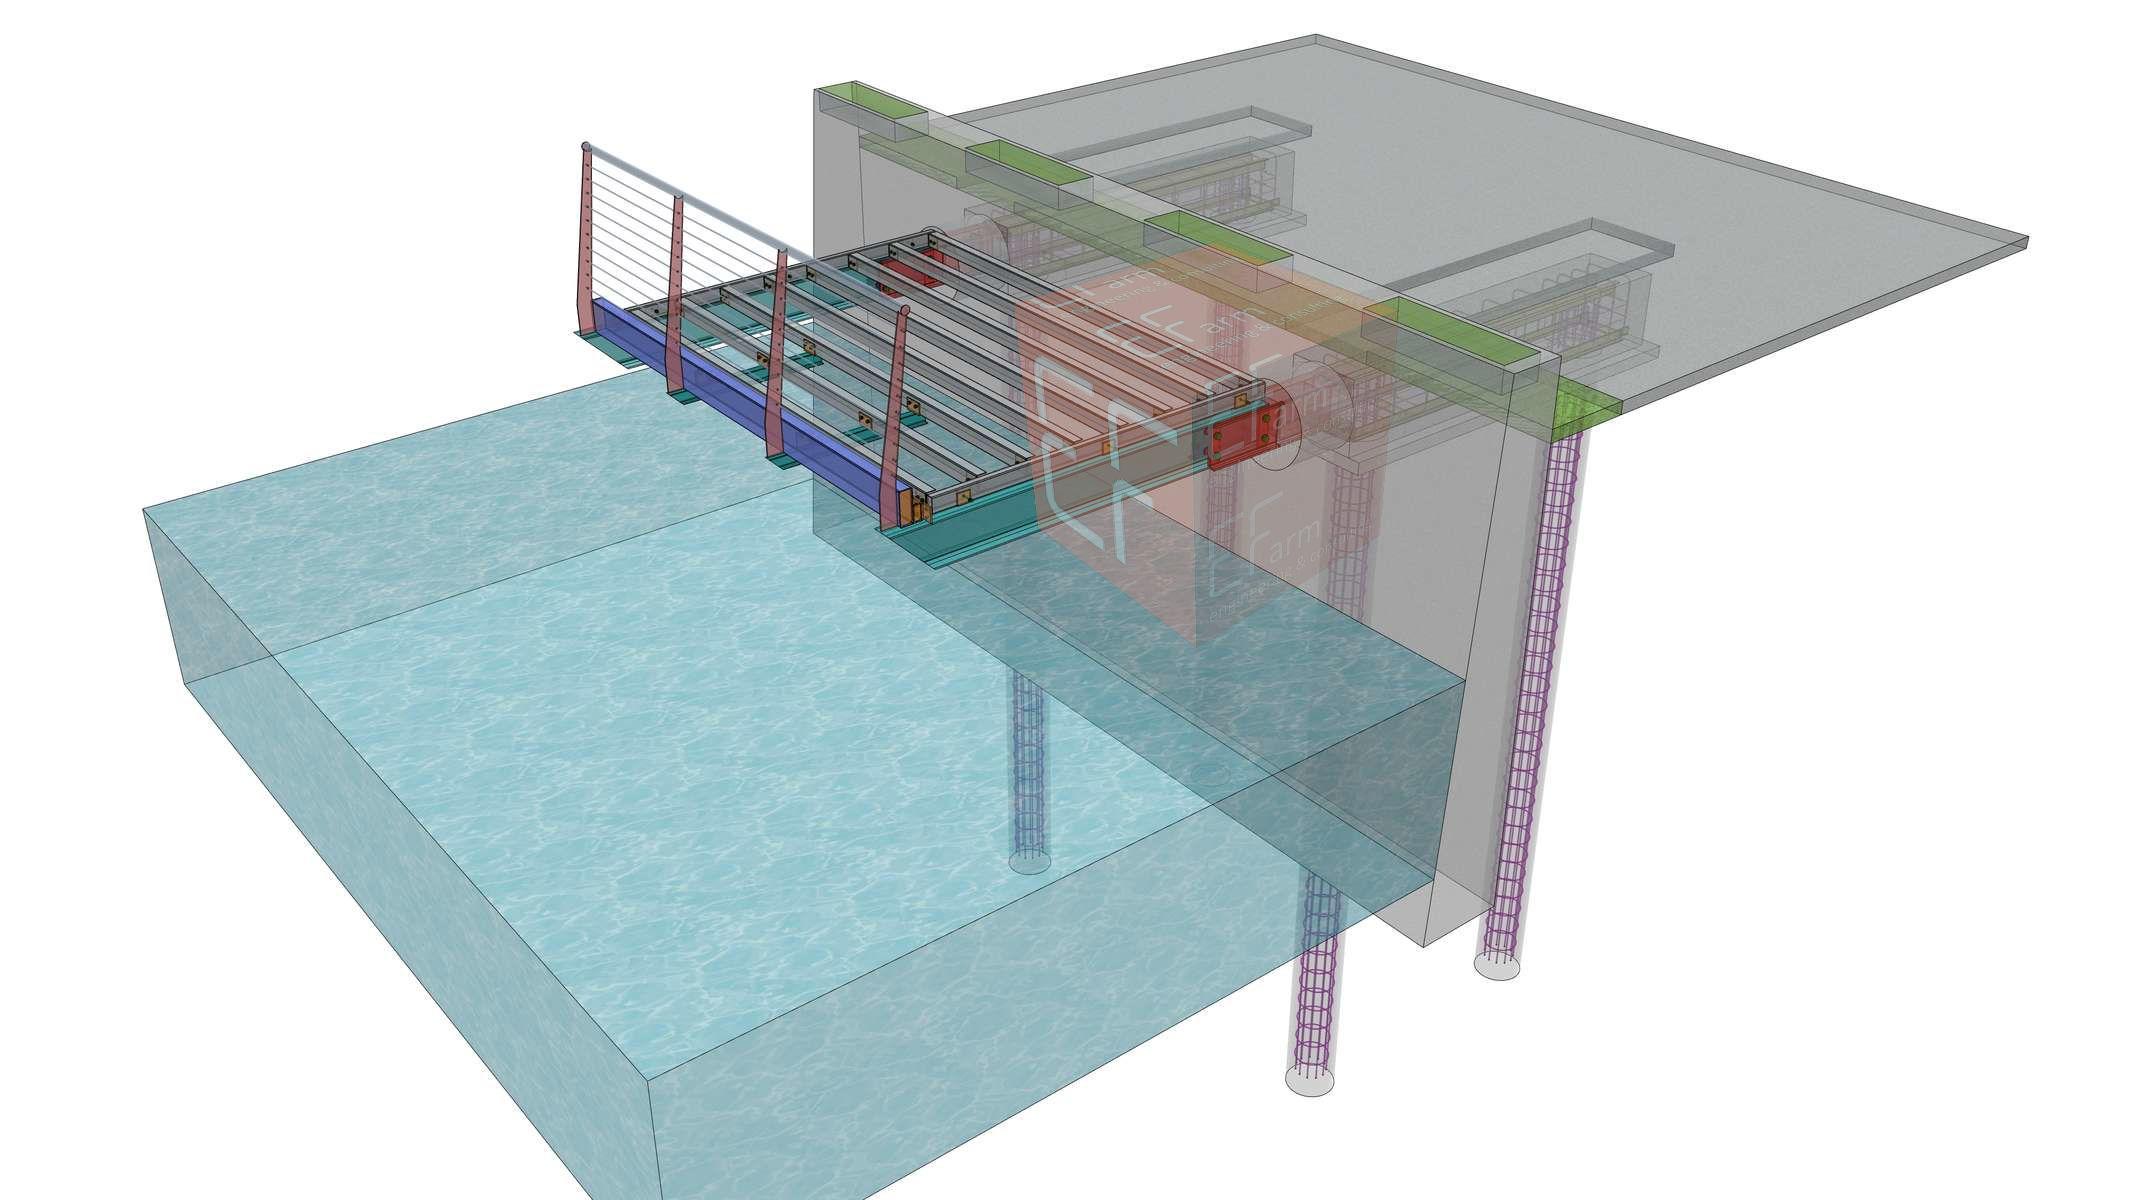 BIM Cavallino E-Farm engineering & consulting